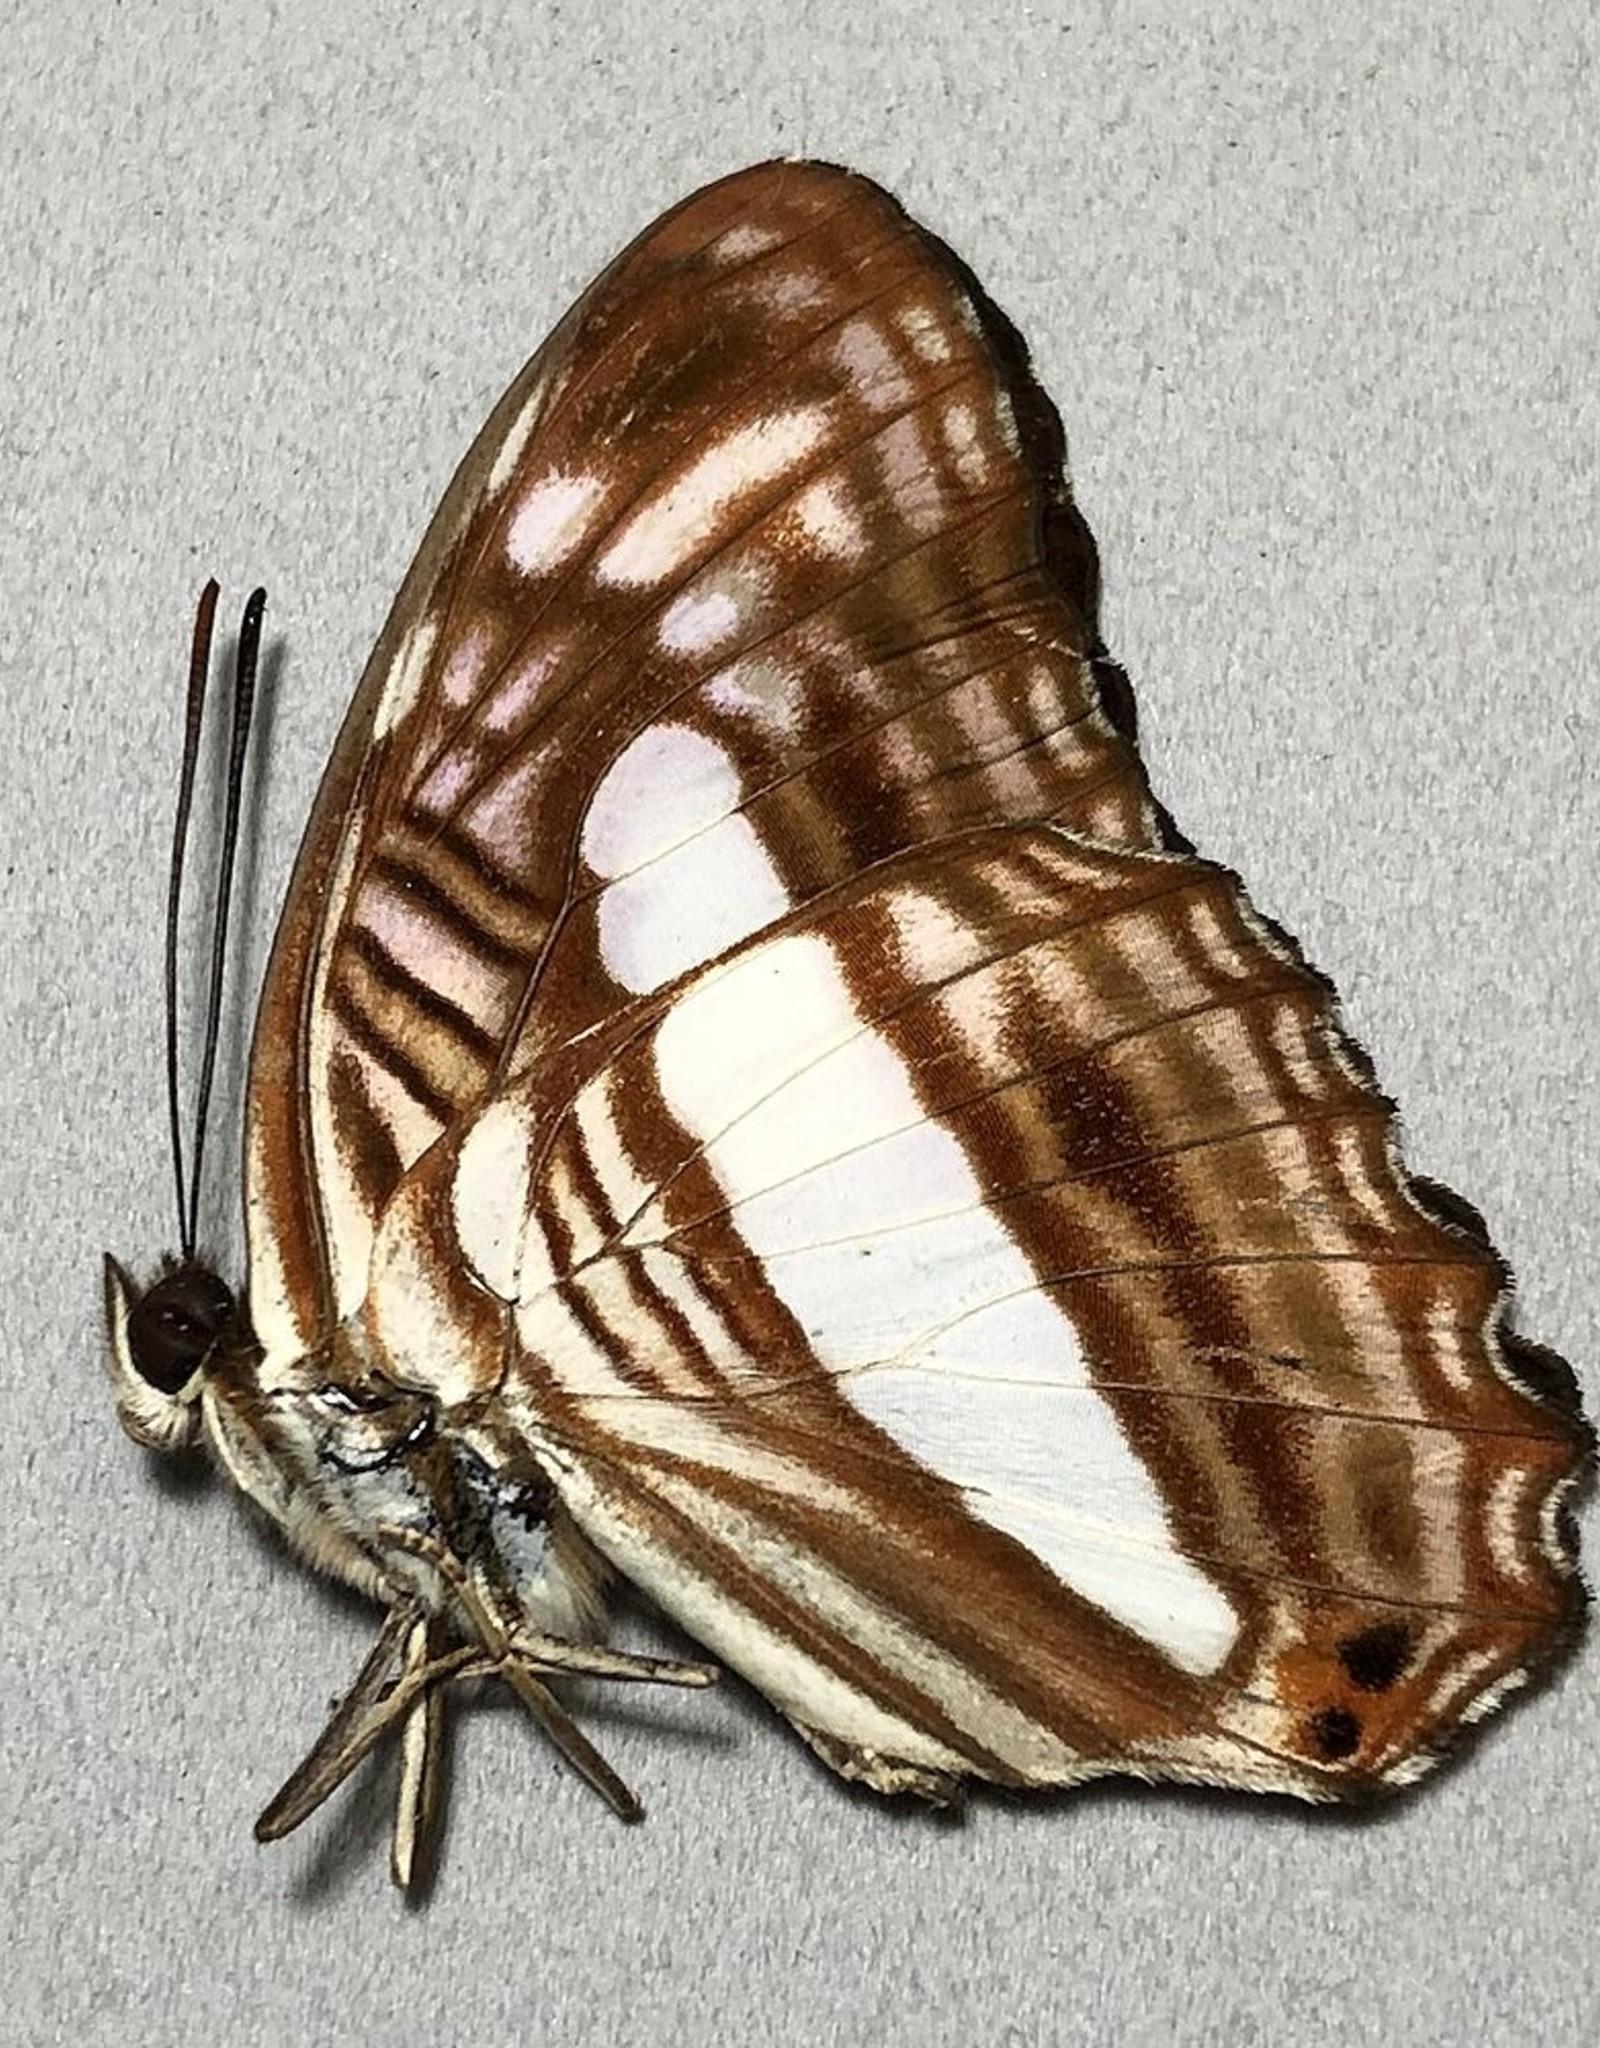 Adelpha iphiclus iphiclus M A1- Peru